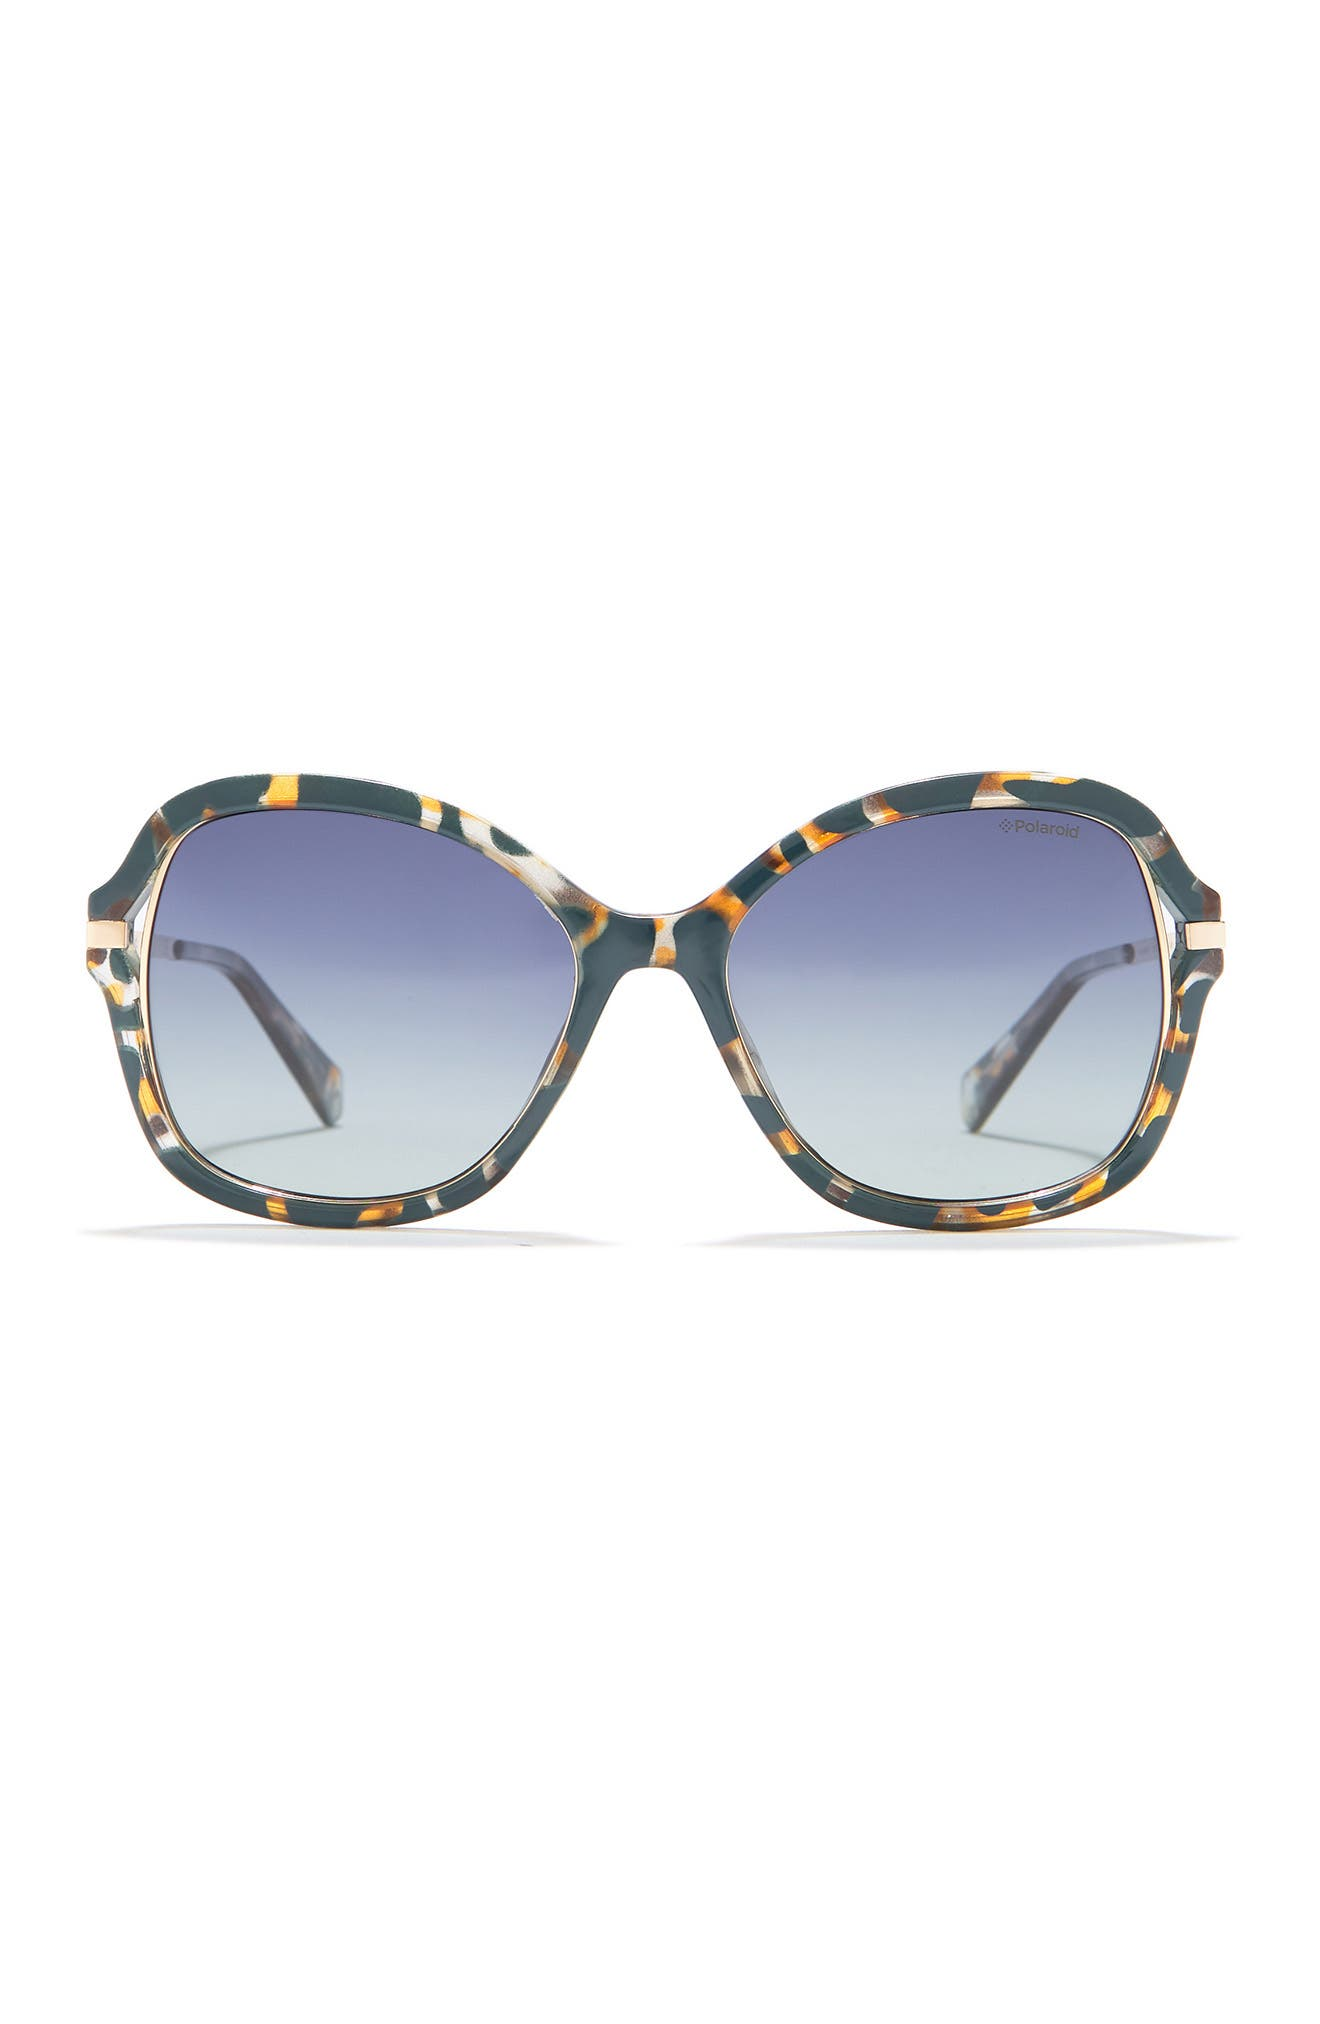 Image of Polaroid 55mm Oversized Sunglasses